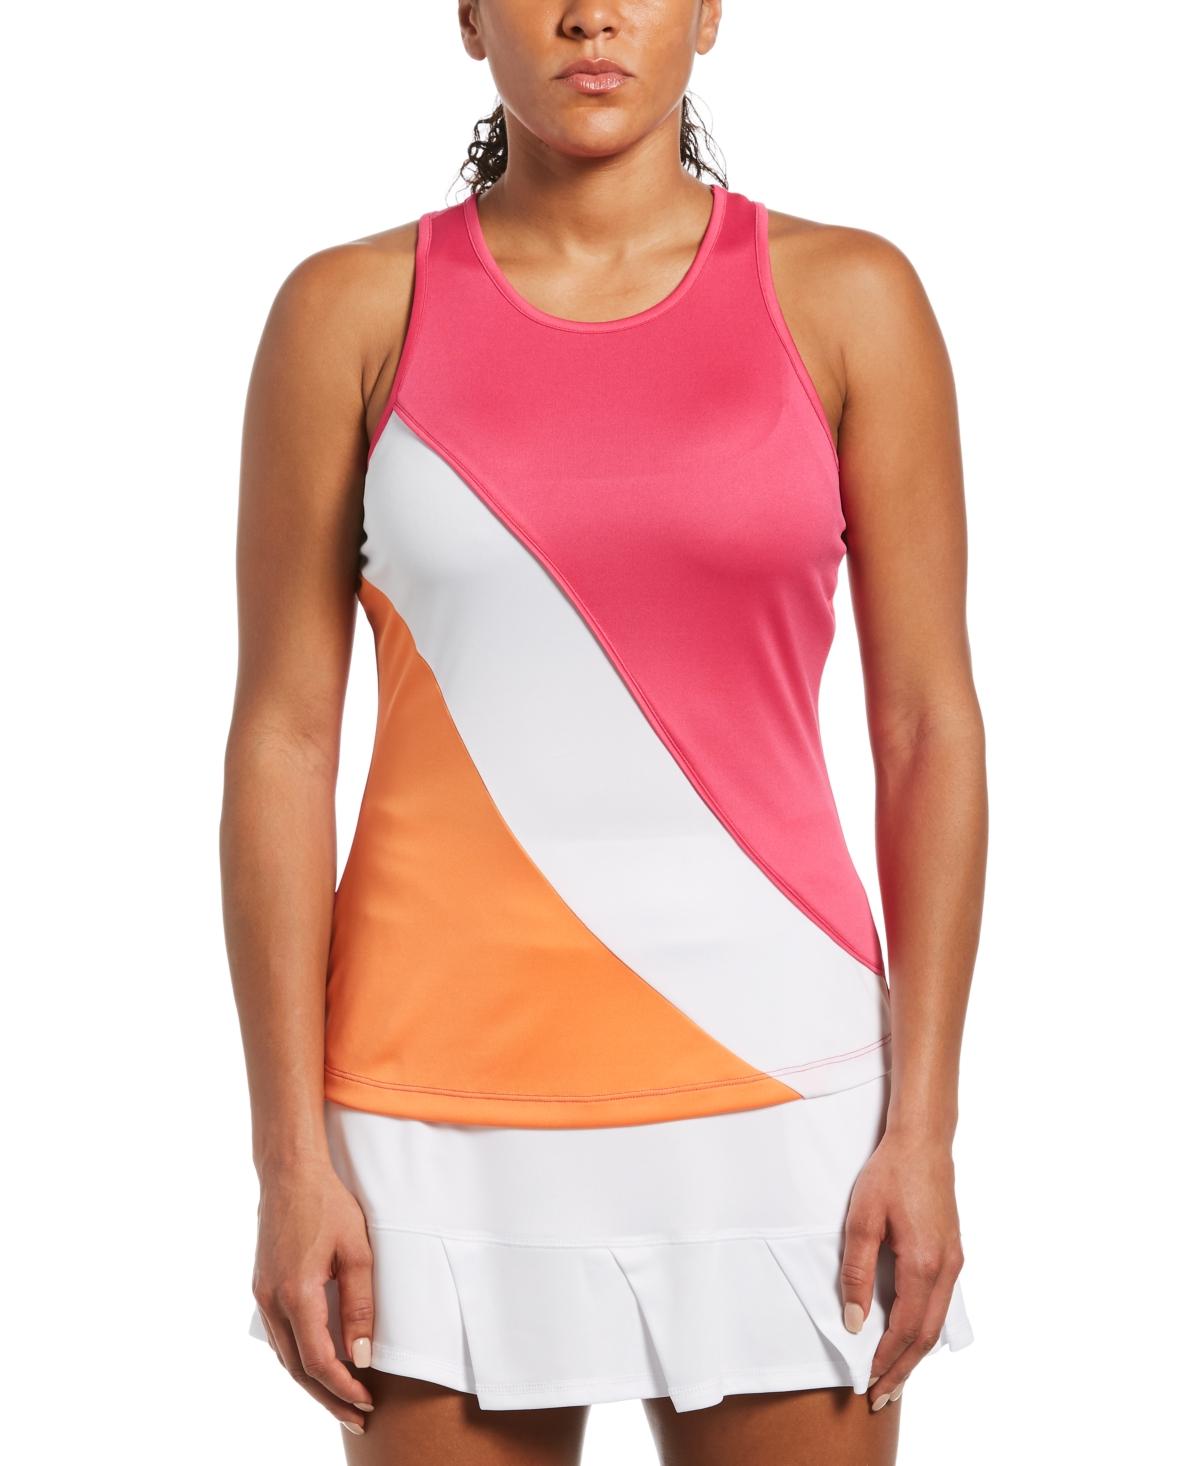 Women's Colorblocked Back-Cutout Tank Top